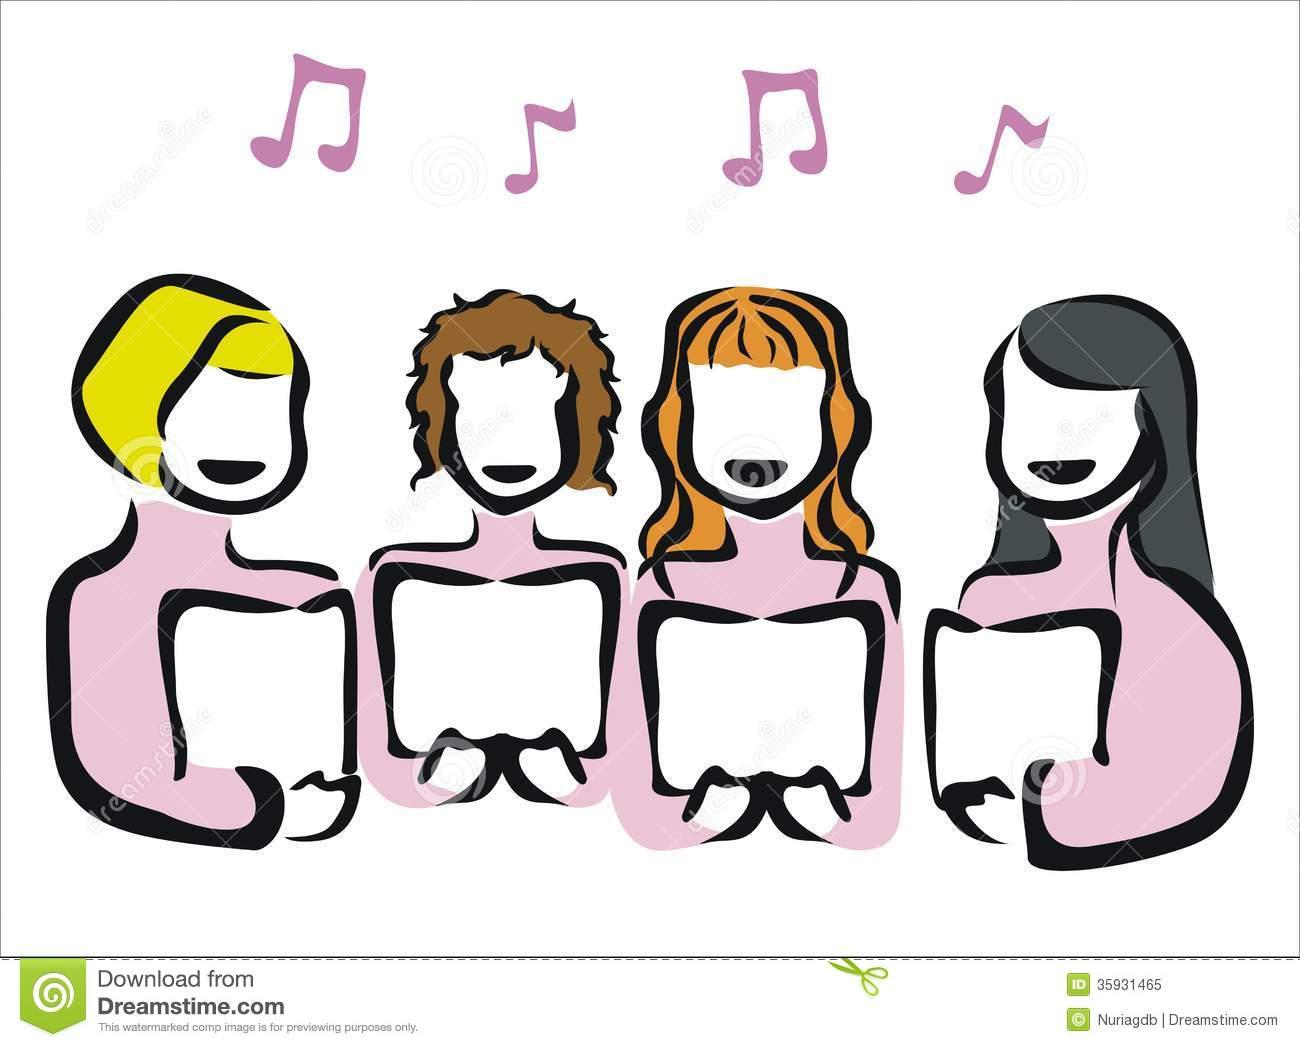 Childrens choir free download. Chorus clipart women's